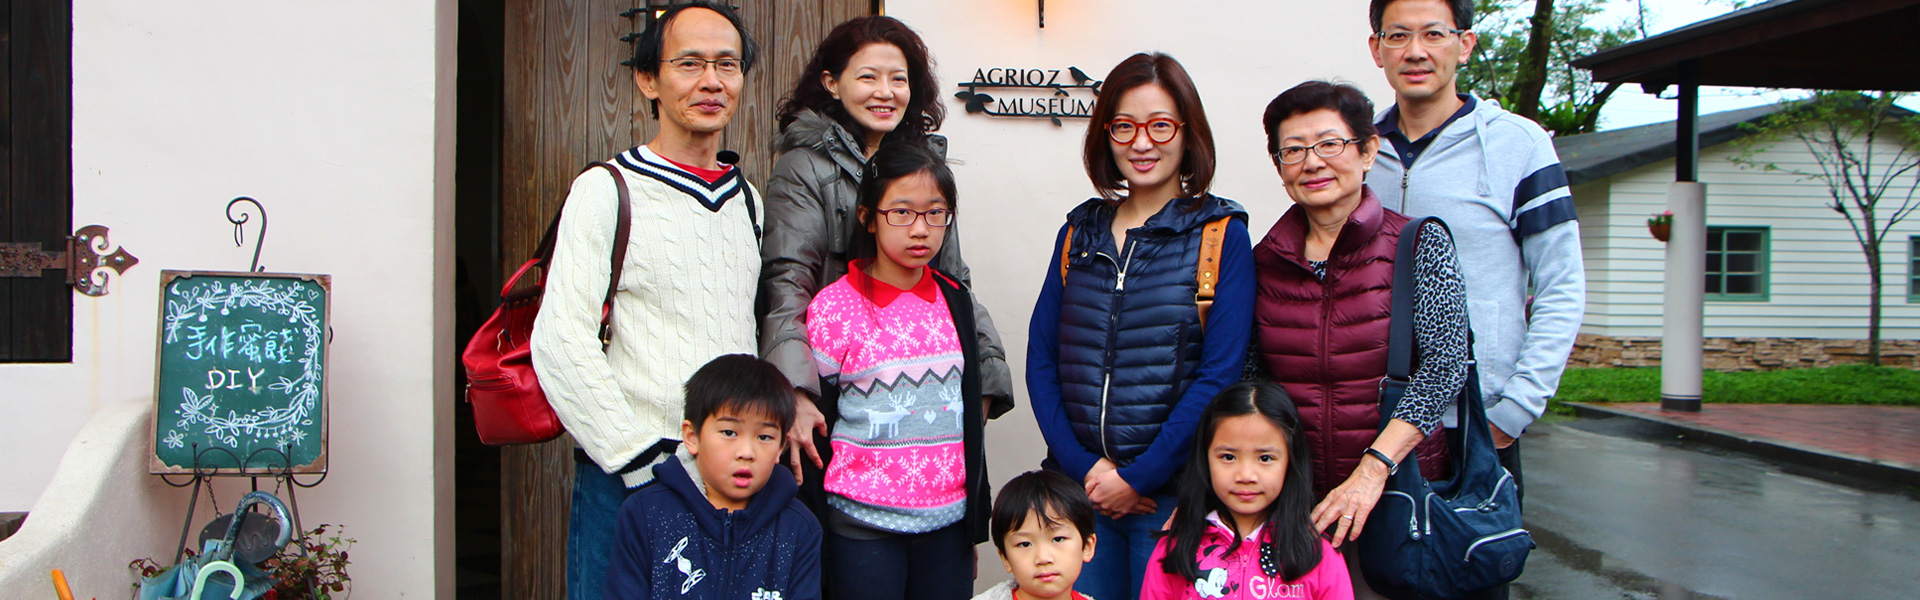 Taiwan Customized Tours multi generational